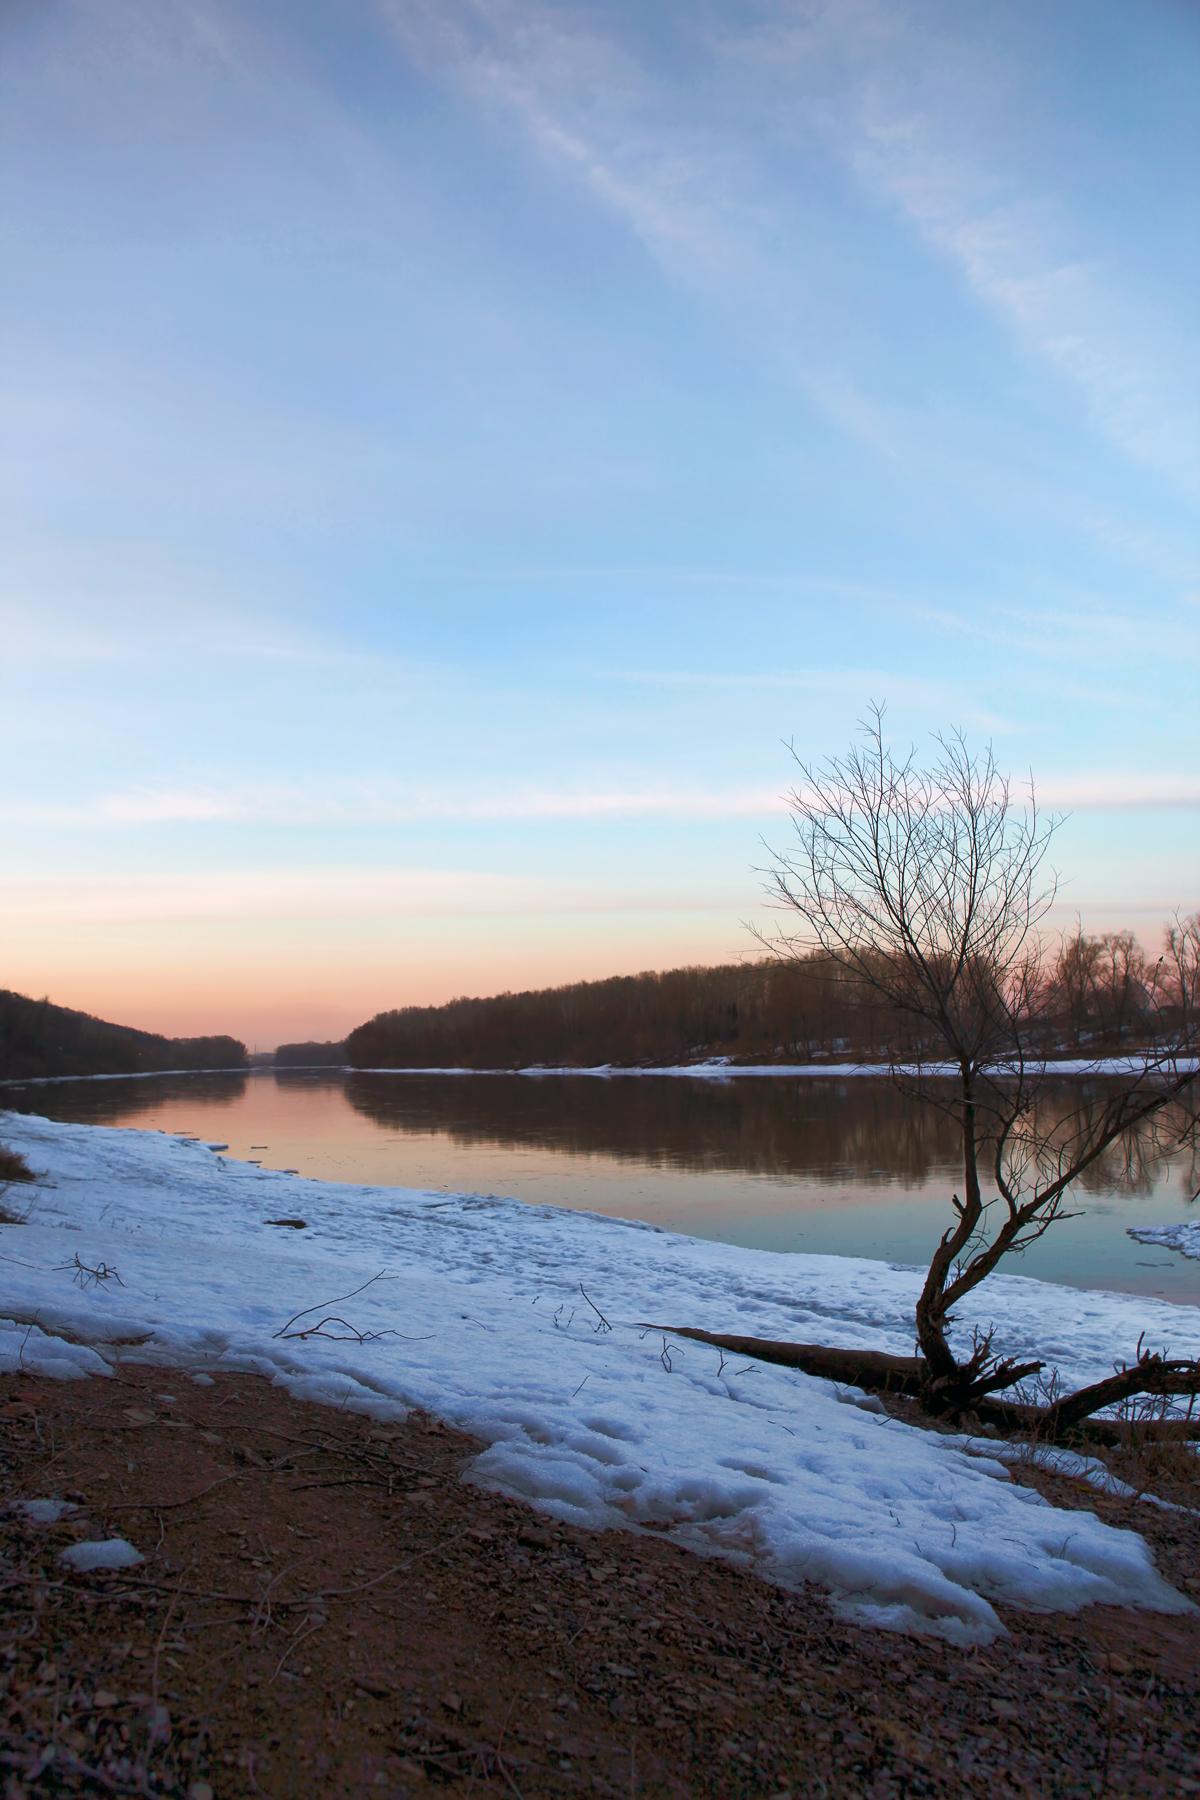 Winter morning photo